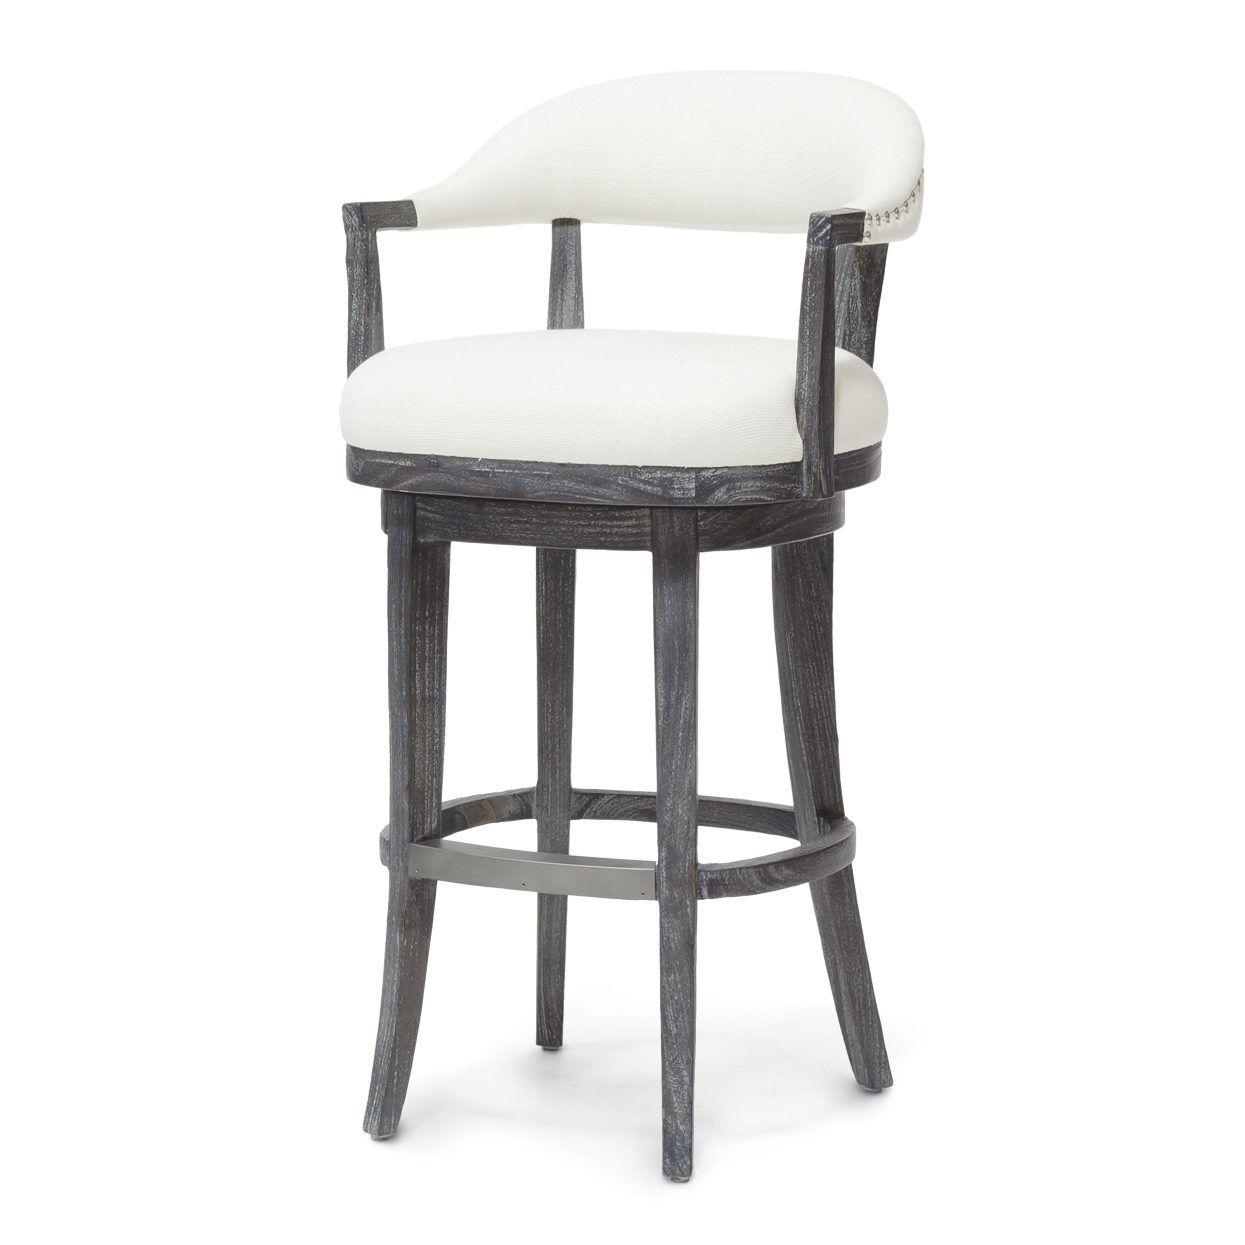 2018 palecek bar stools modern furniture cheap check more at http evildaysoflucklessjohn